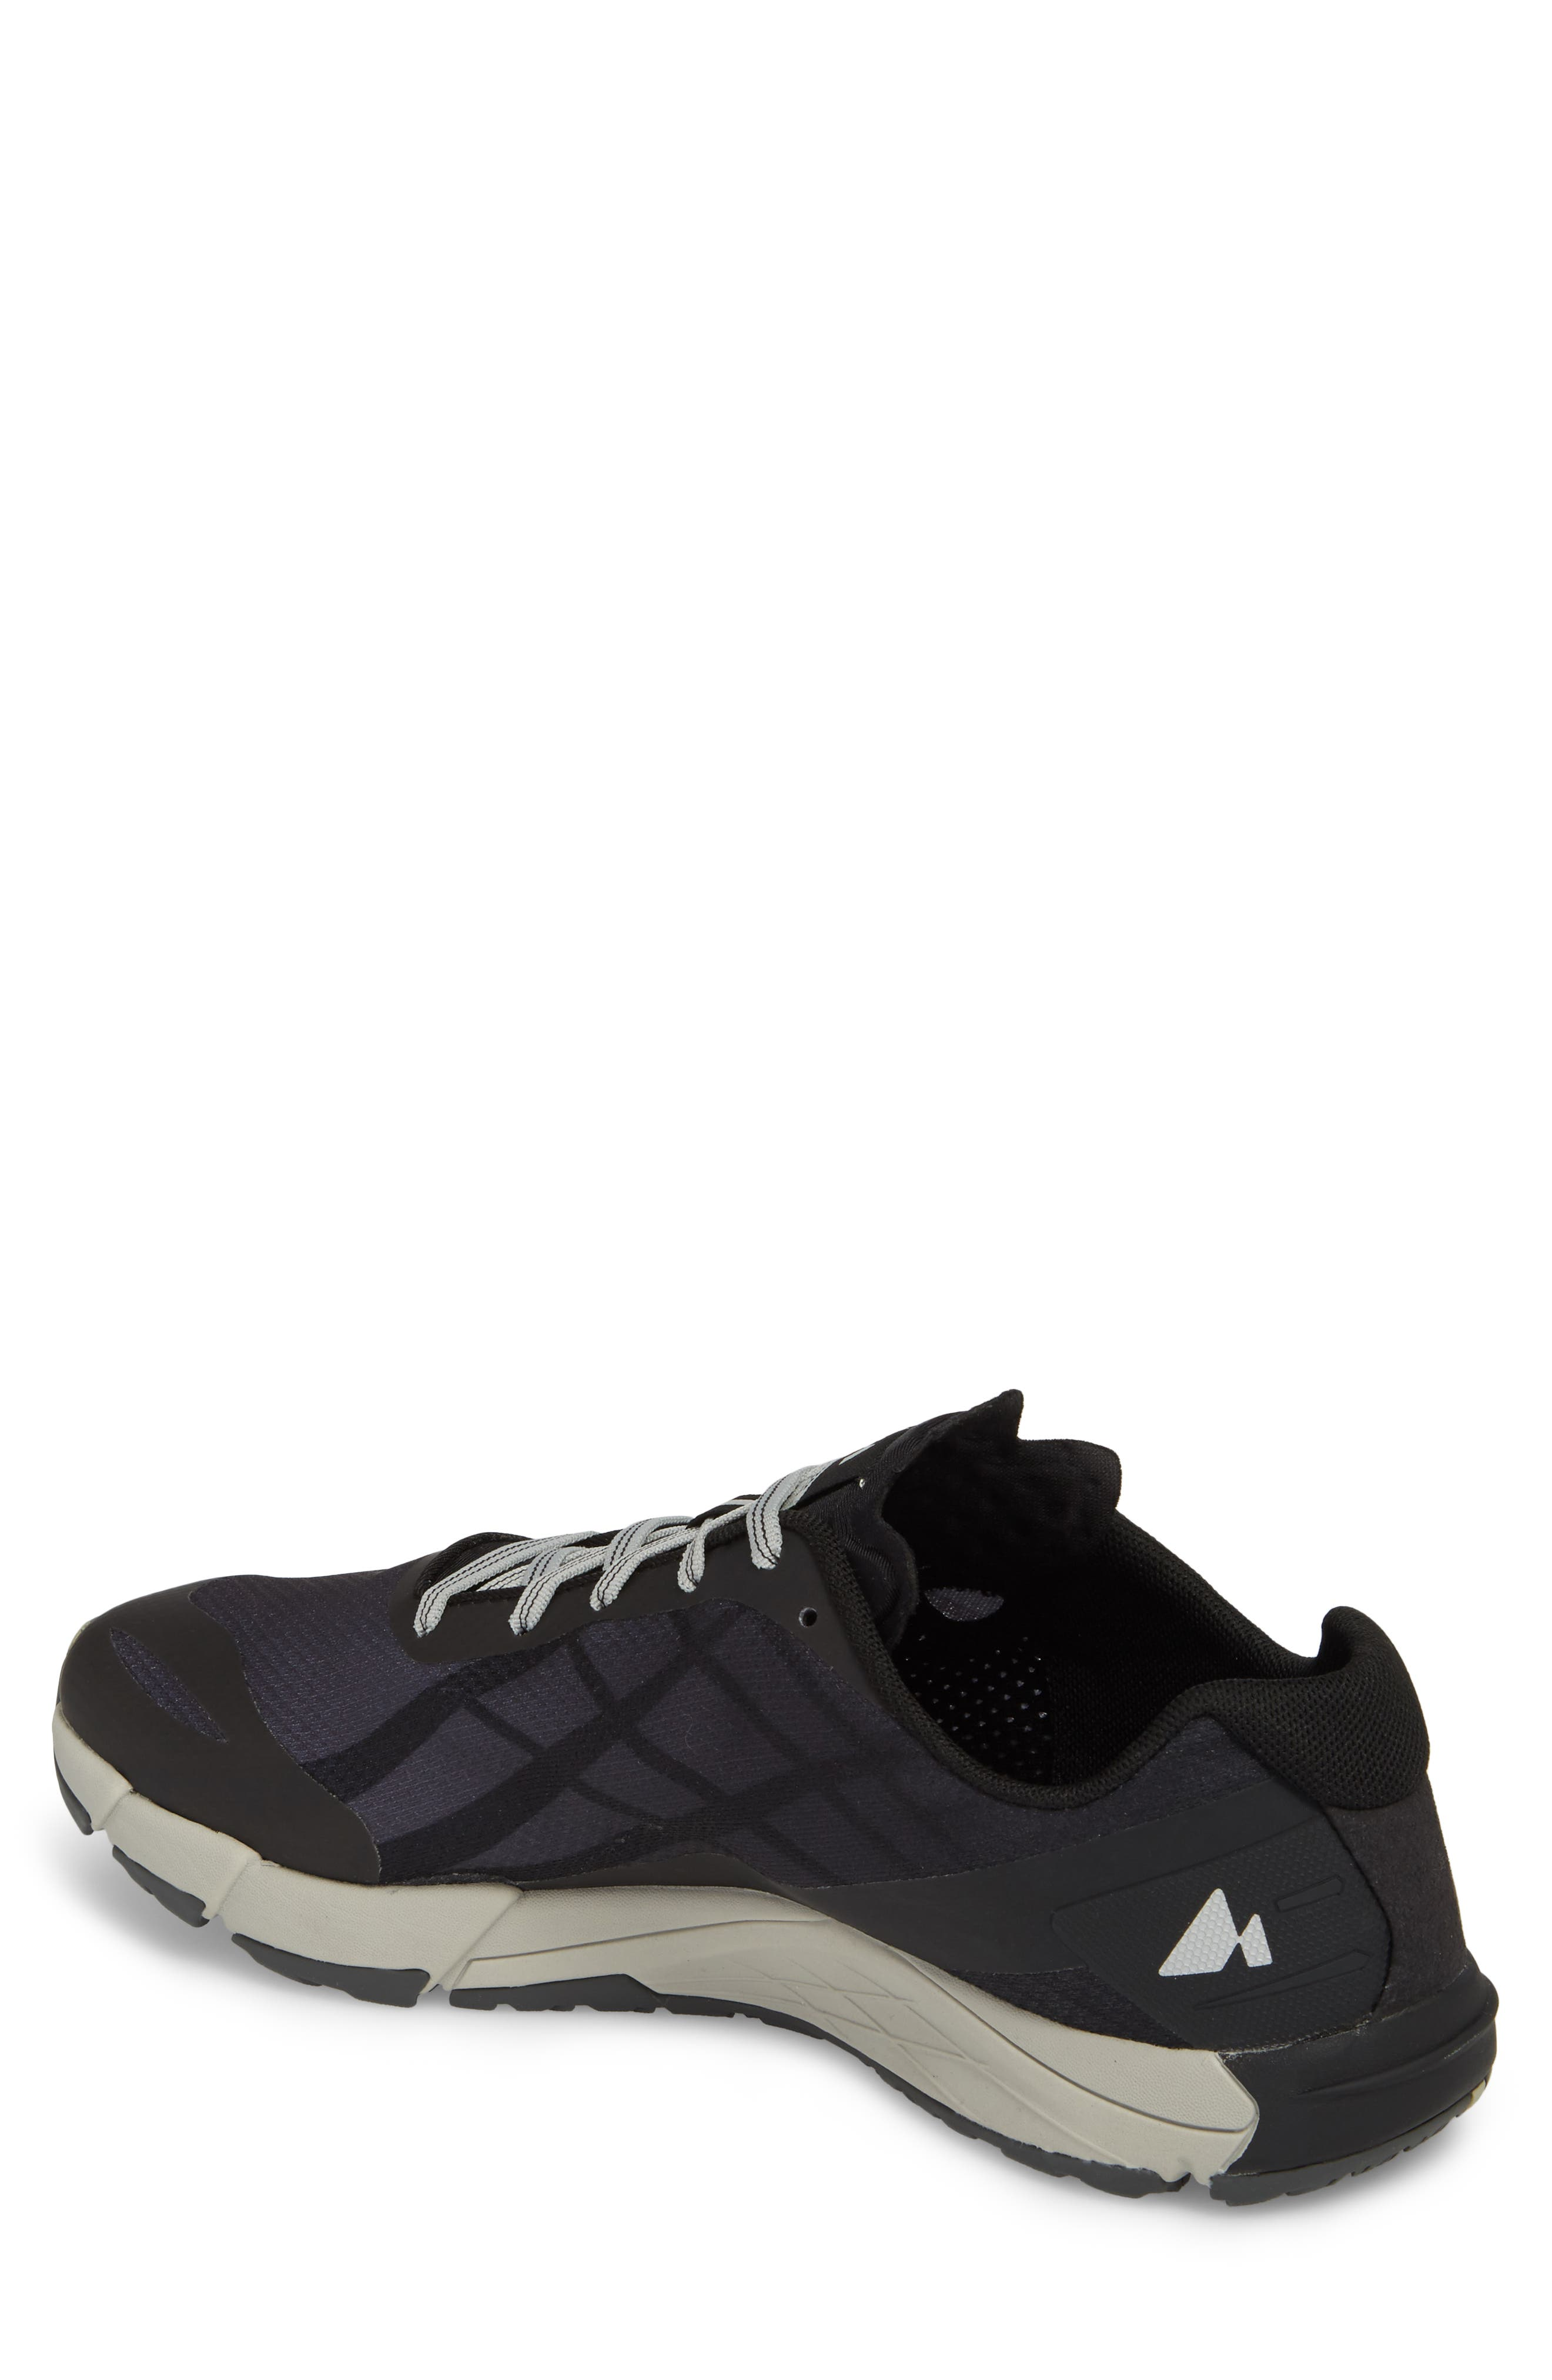 Bare Access Flex Running Shoe,                             Alternate thumbnail 2, color,                             Black/ Silver